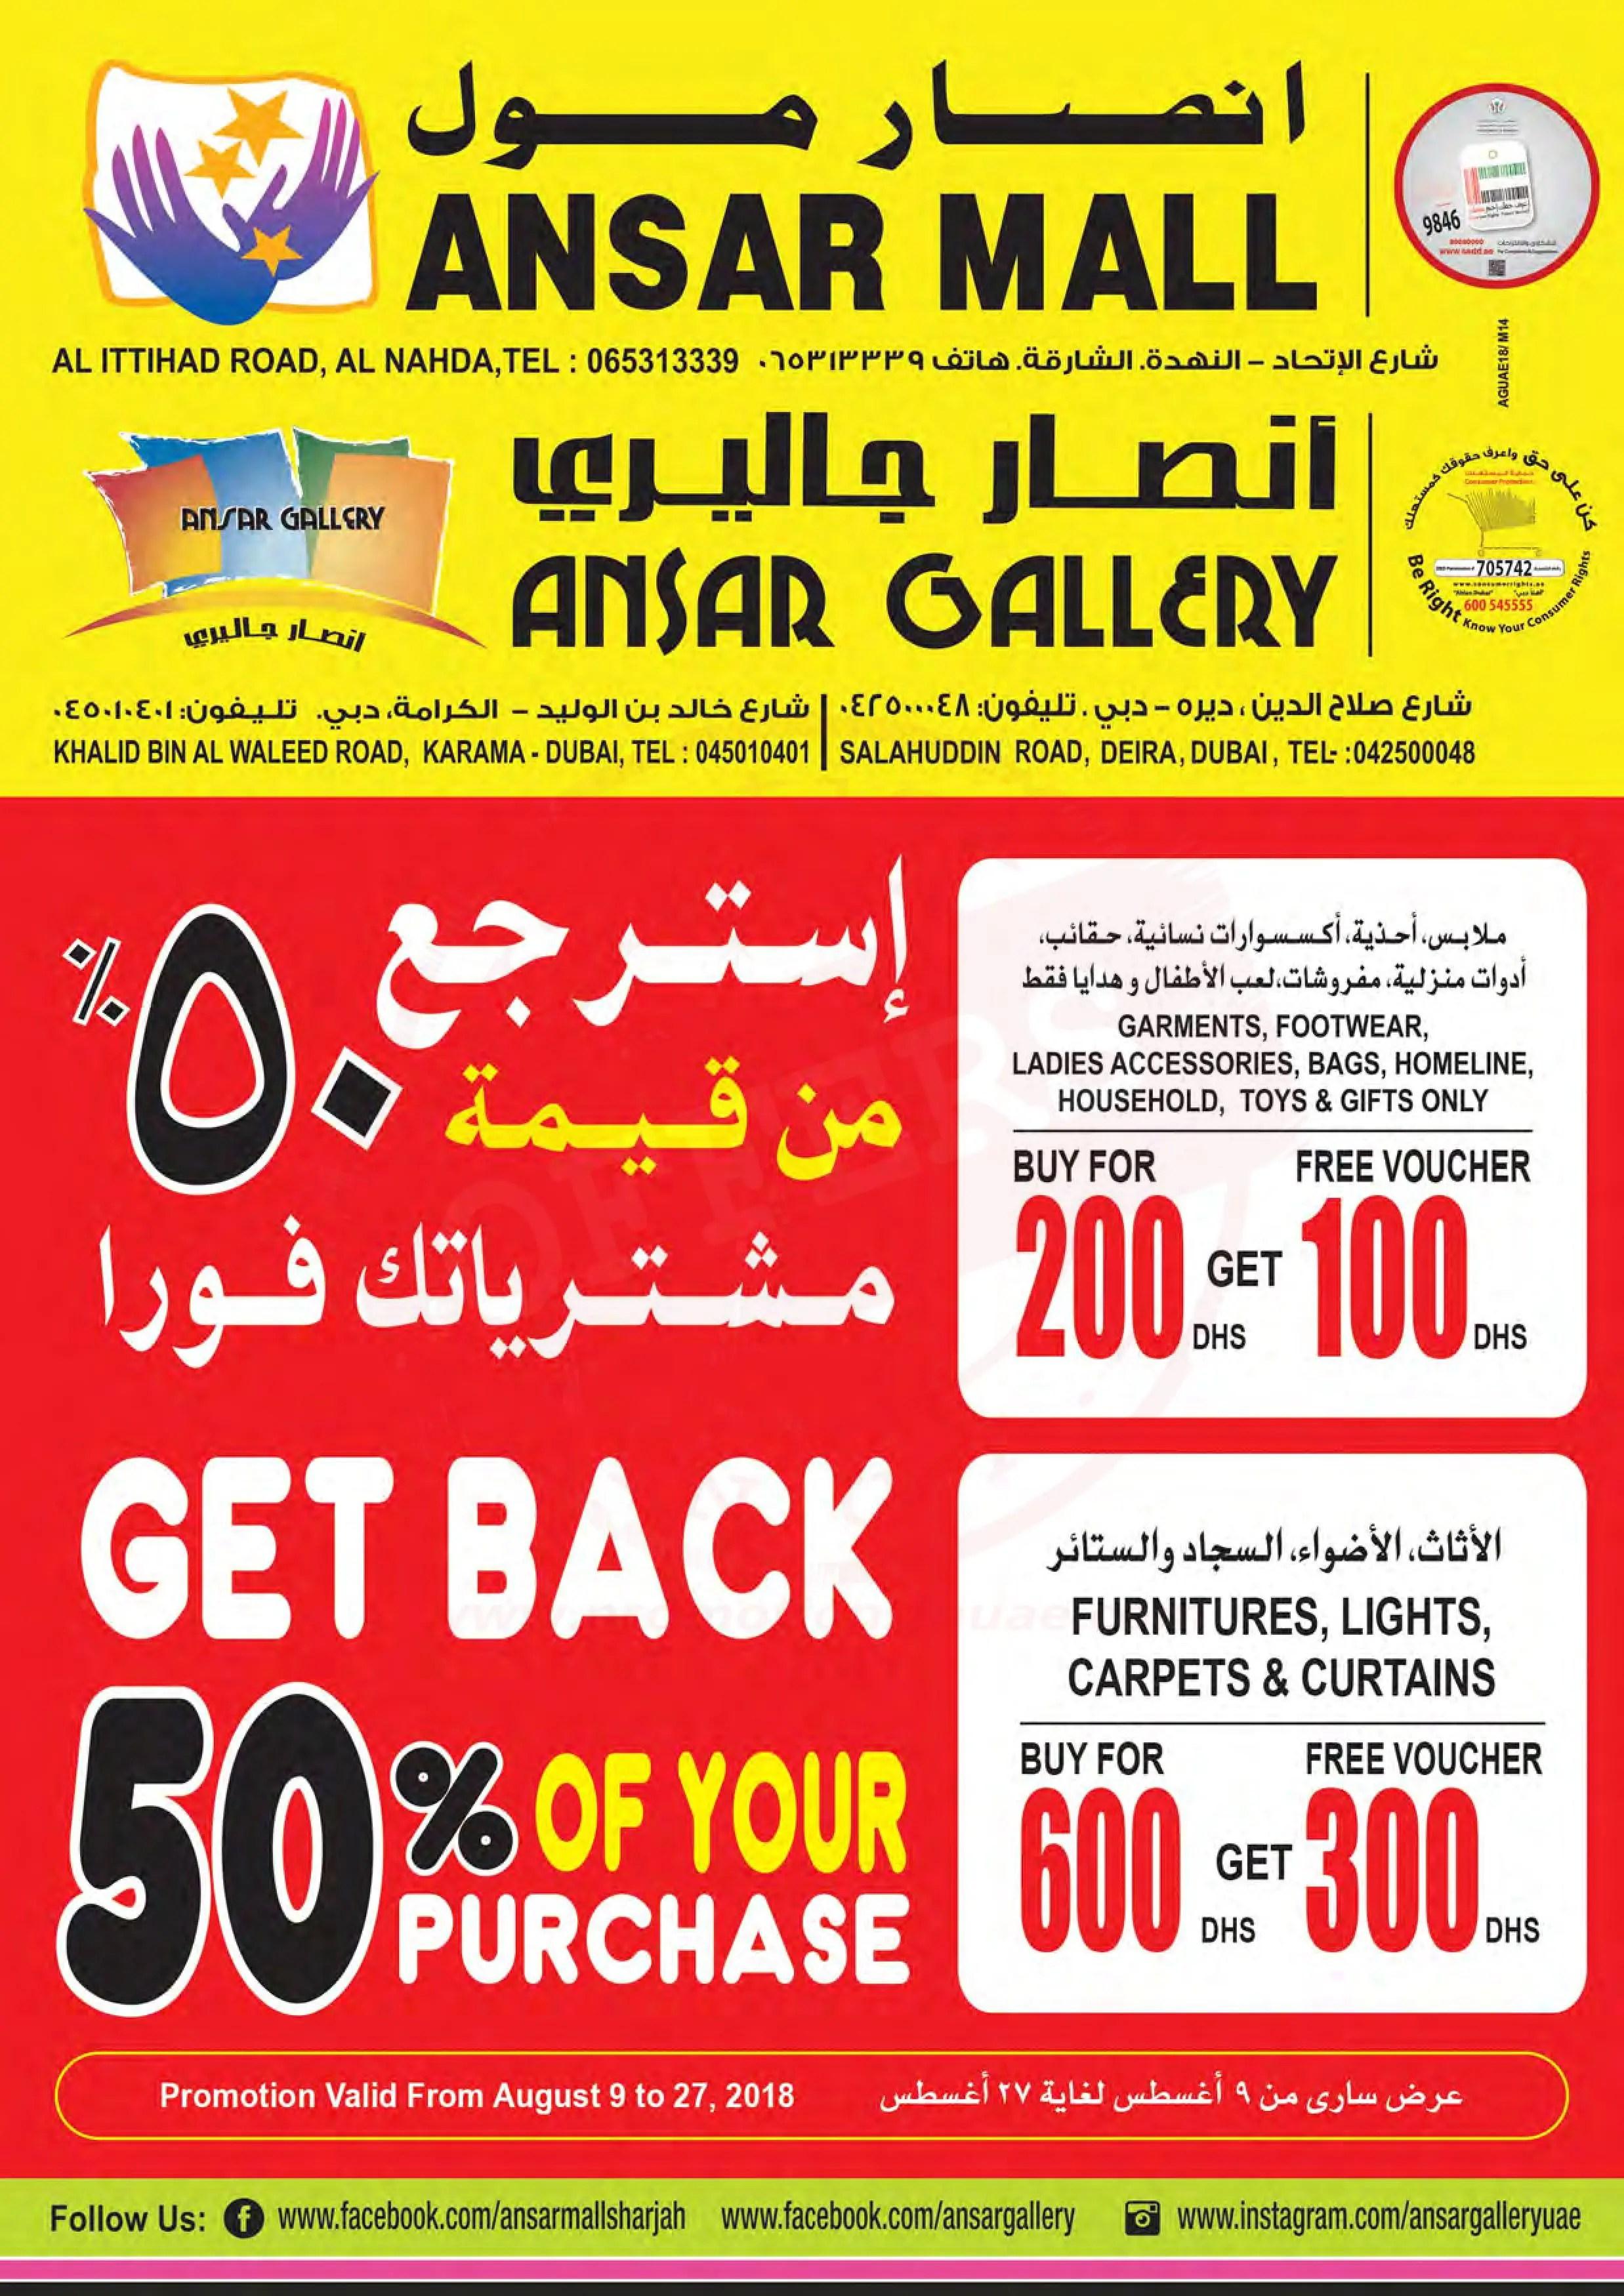 Ansar Mall Ansar Gallery GET BACK 50% OFFER - Promotionsinuae